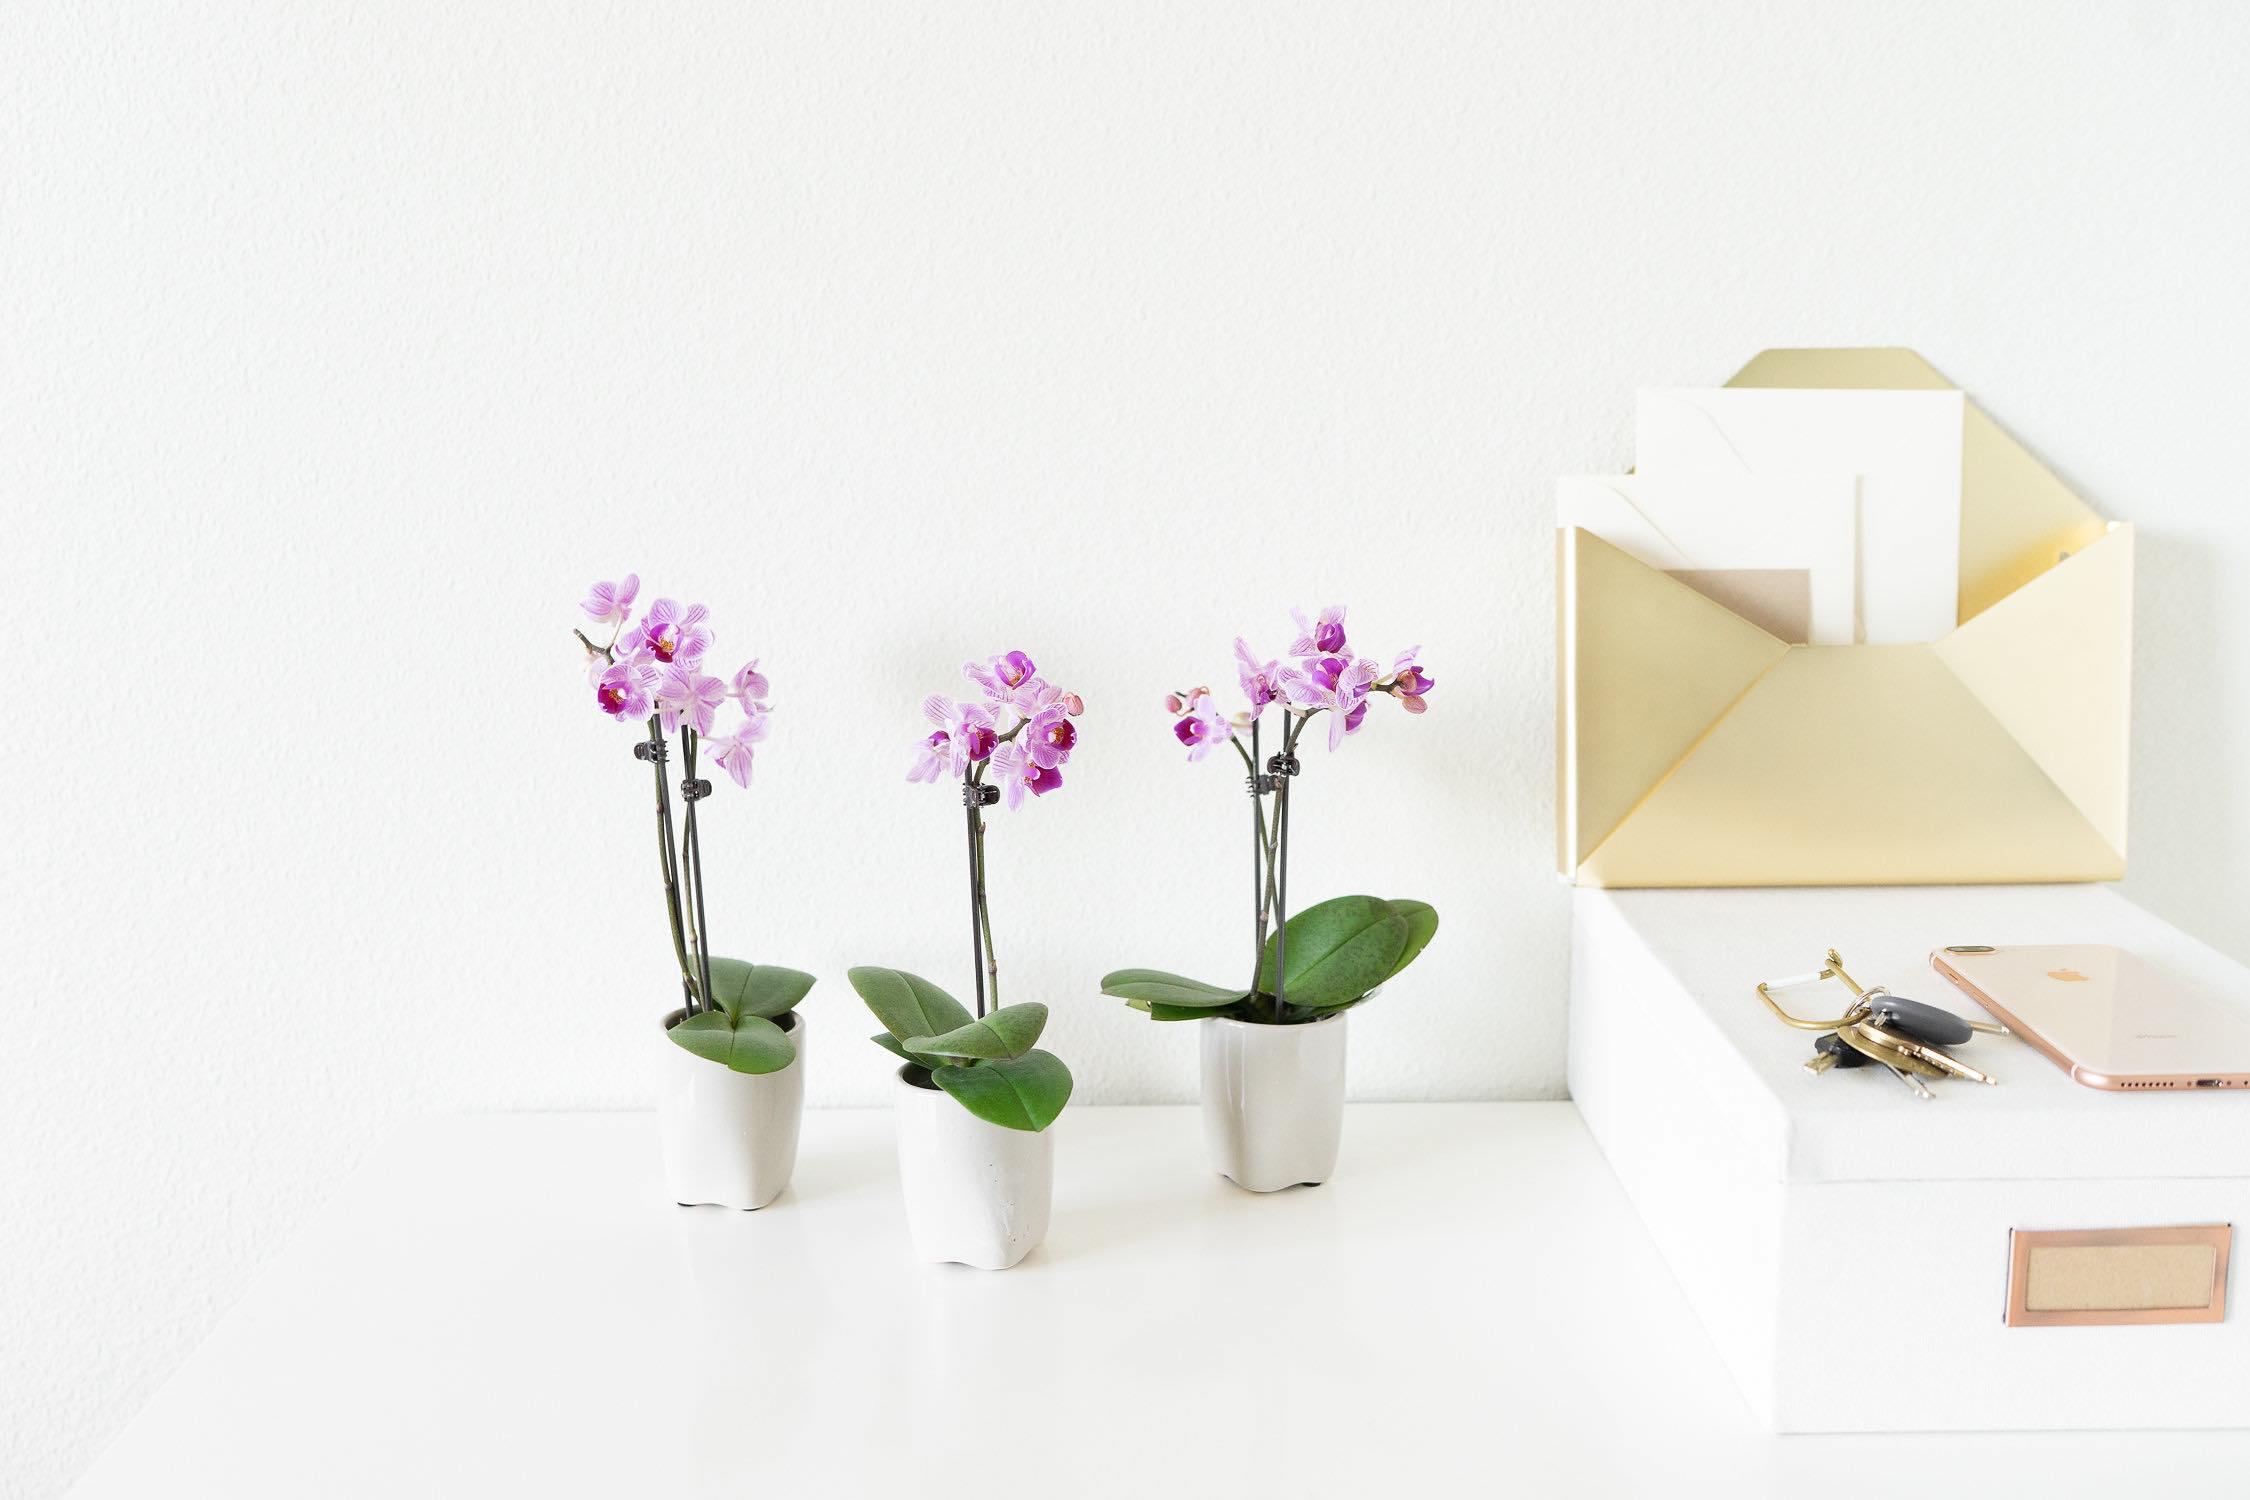 Orchids for valentine's daya.jpg